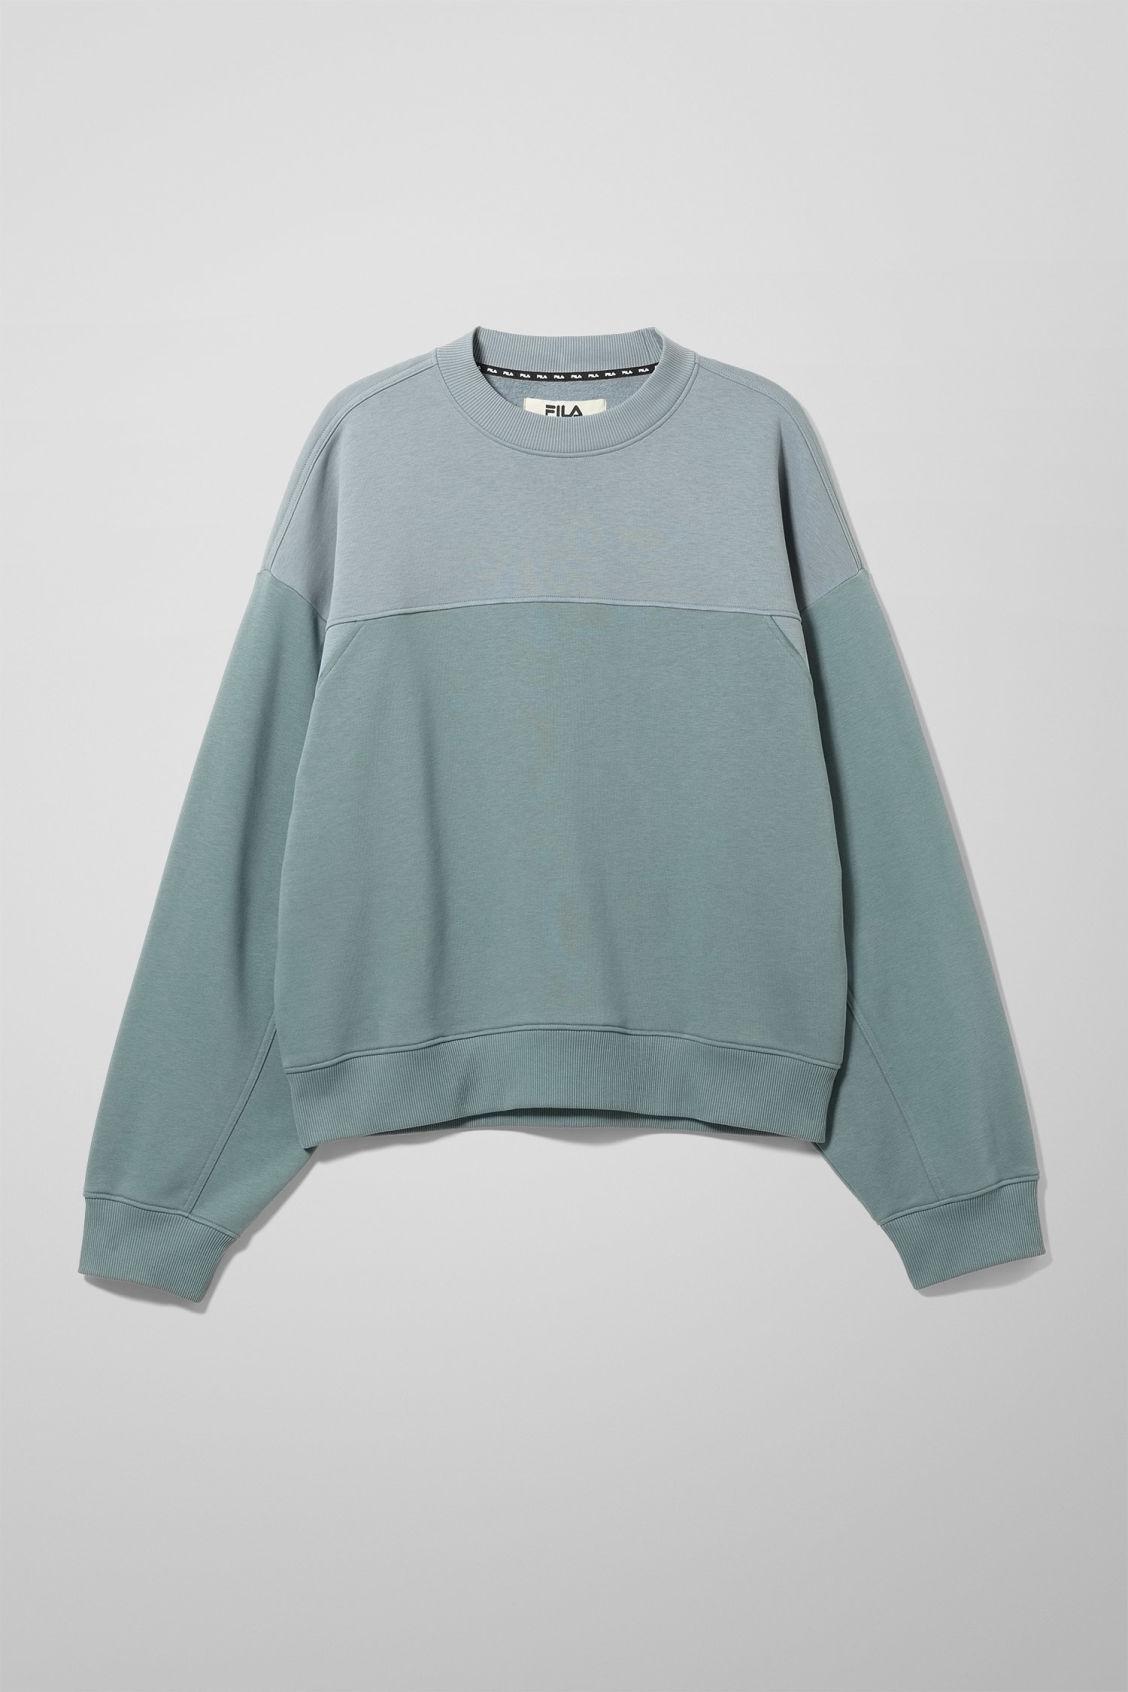 FILA FOR WEEKDAY IAN Sweater grey